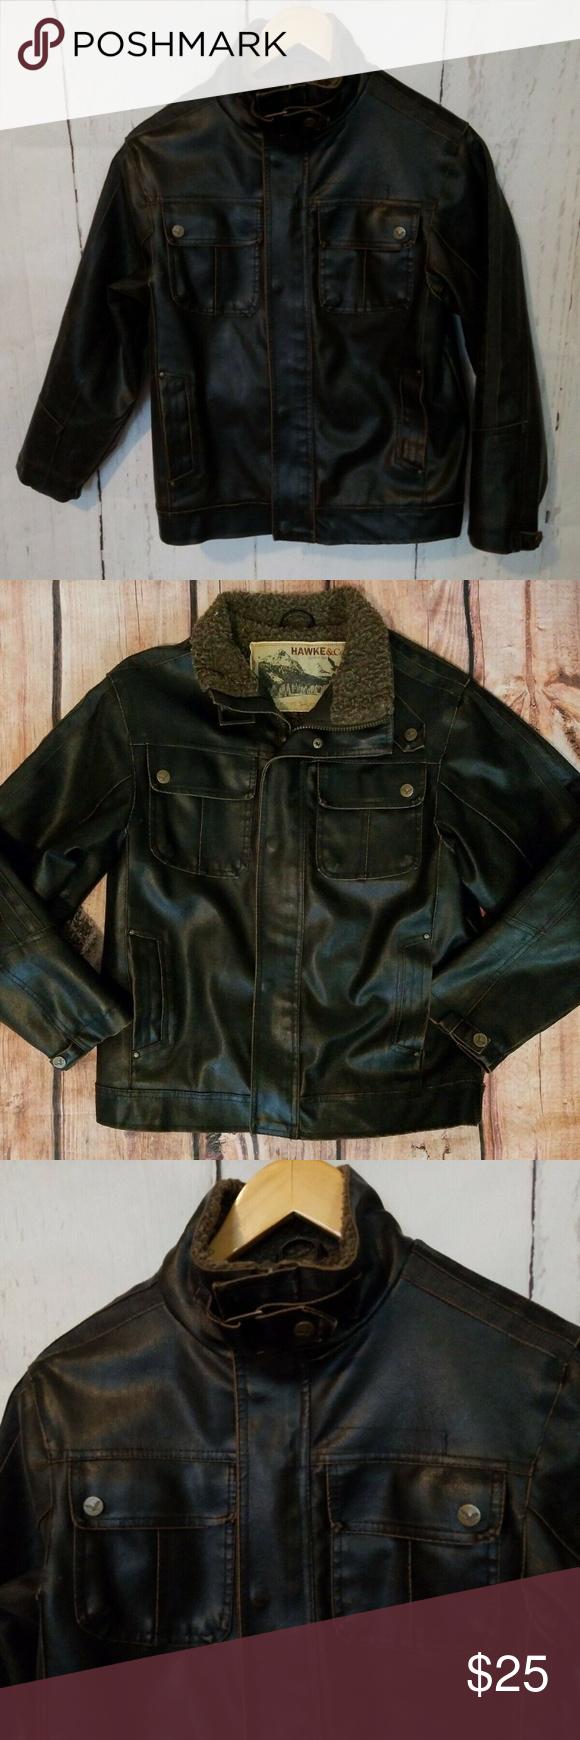 Hawke Co Bomber Faux Leather Jacket Kid S 10 12 Leather Jacket Kids Jacket Jackets [ 1740 x 580 Pixel ]